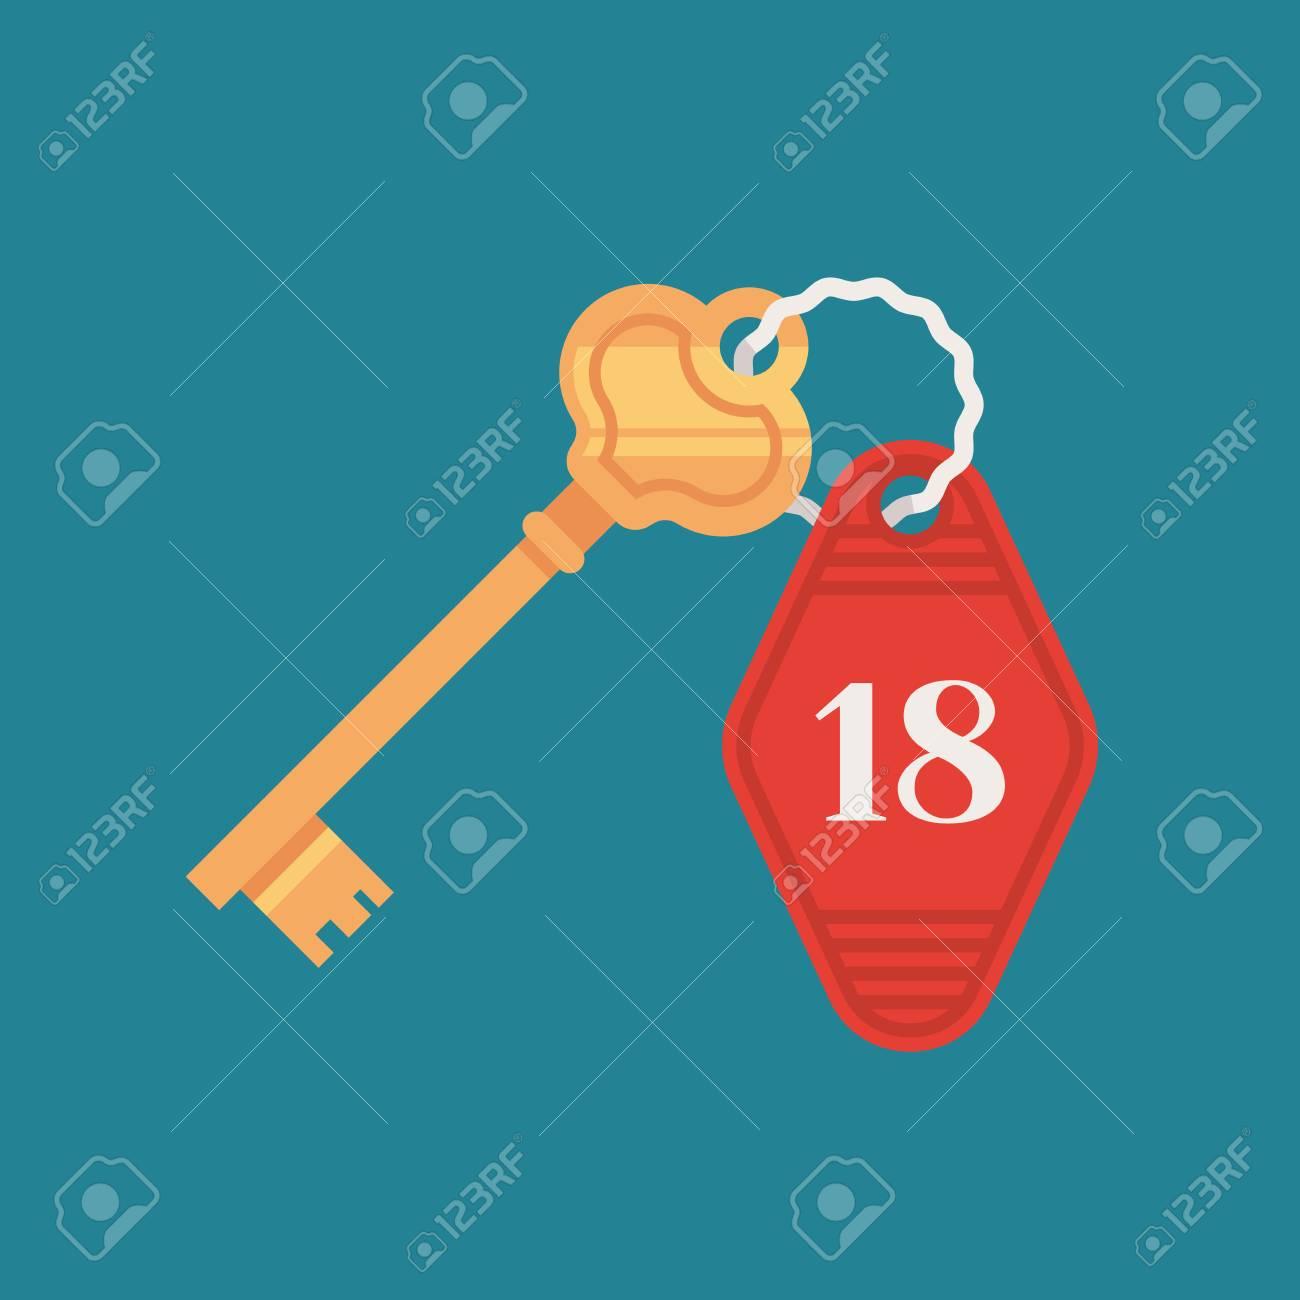 door lock and key cartoon. Door Lock Key With Room Number Badge In Cartoon Illustration. Stock Vector - 91881356 And